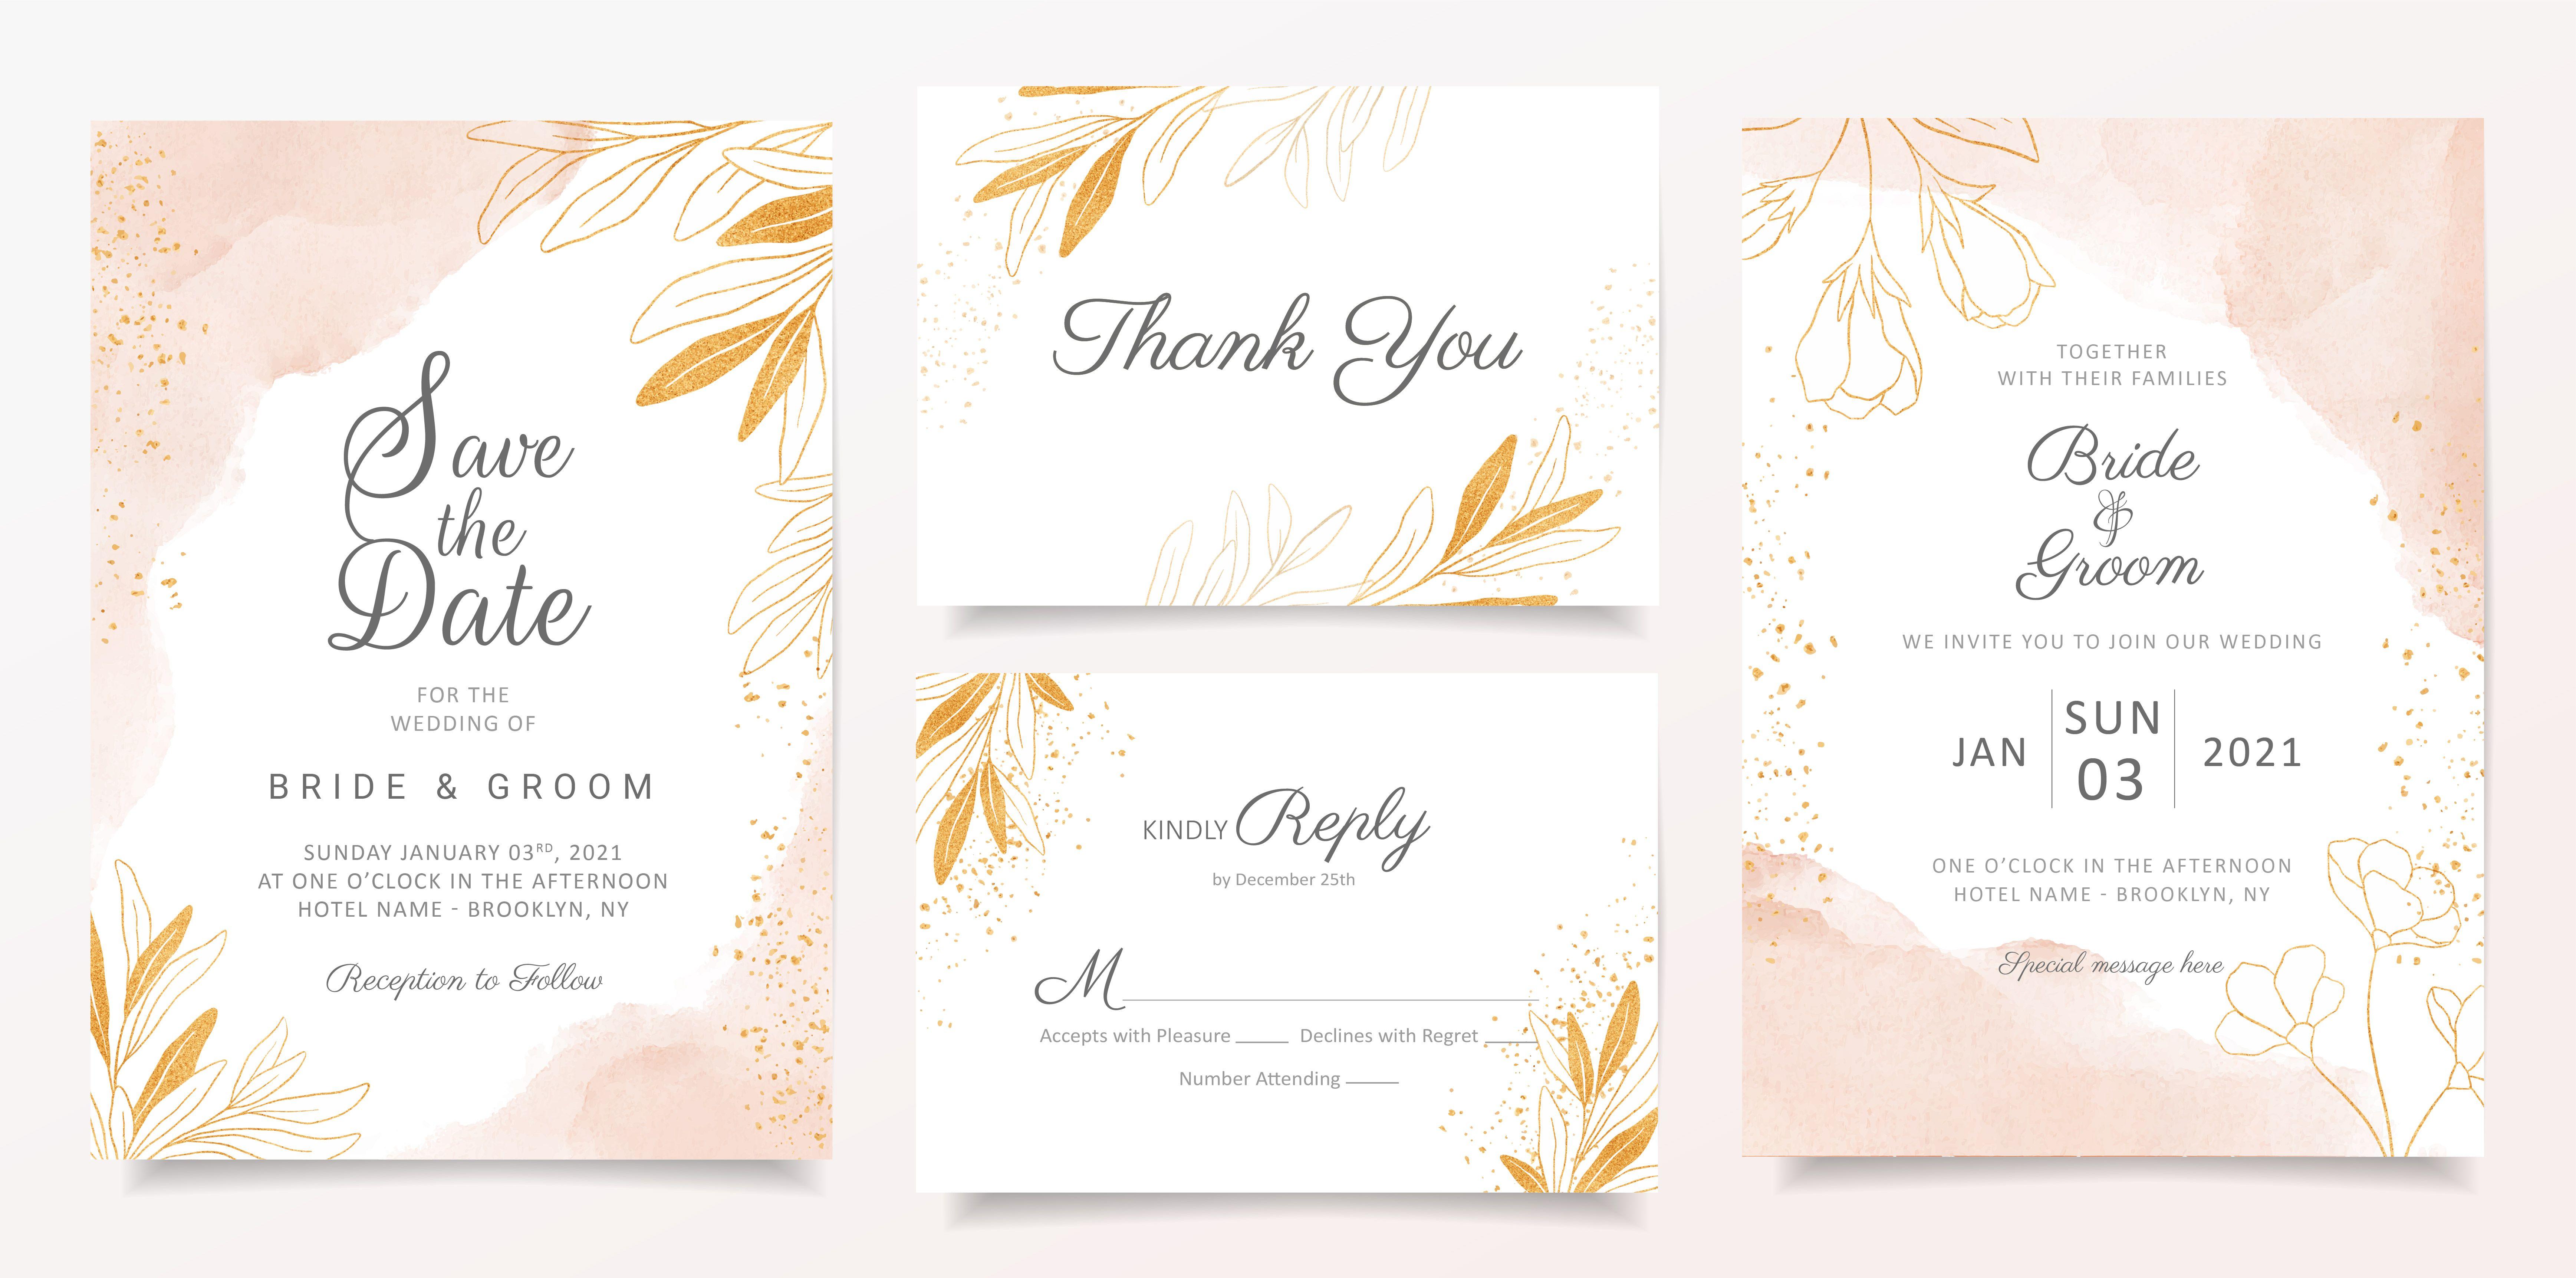 Watercolor Creamy Wedding Invitation Card Template Set With Golden Floral Decor Contoh Undangan Pernikahan Undangan Pernikahan Mewah Desain Undangan Perkawinan